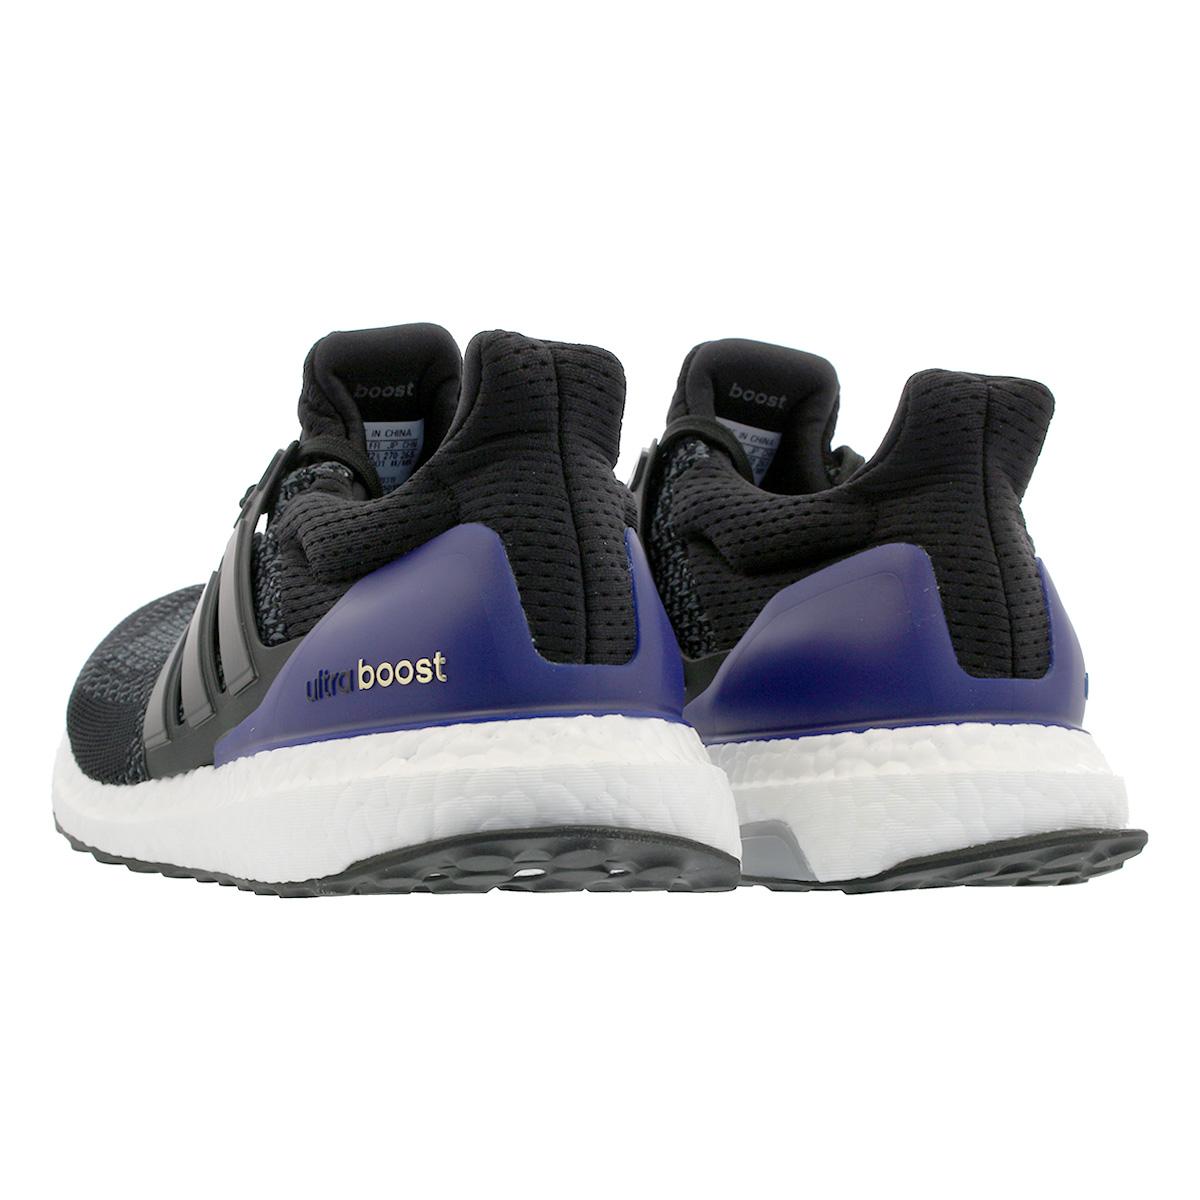 f3e71b79806cf adidas ULTRA BOOST Adidas ultra boost CORE BLACK CORE BLACK GOLD MET g28319